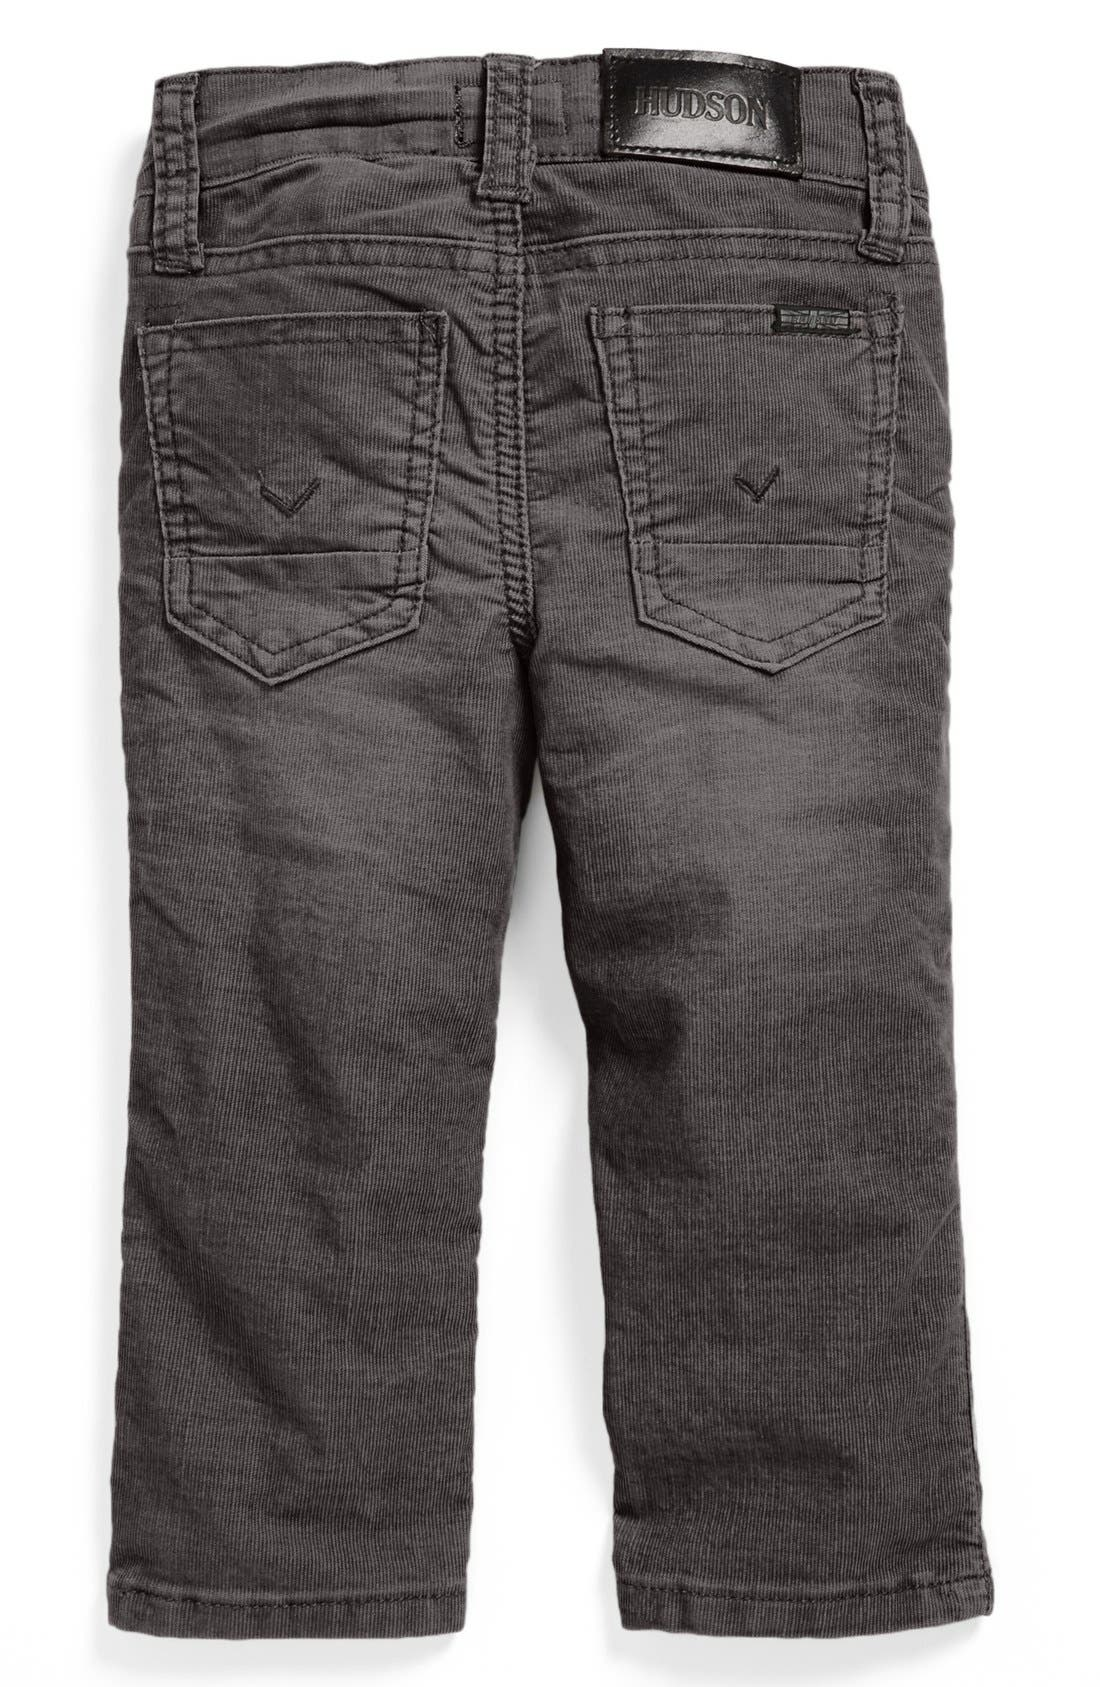 Main Image - Hudson Kids 'Parker' Corduroy Jeans (Baby Boys)